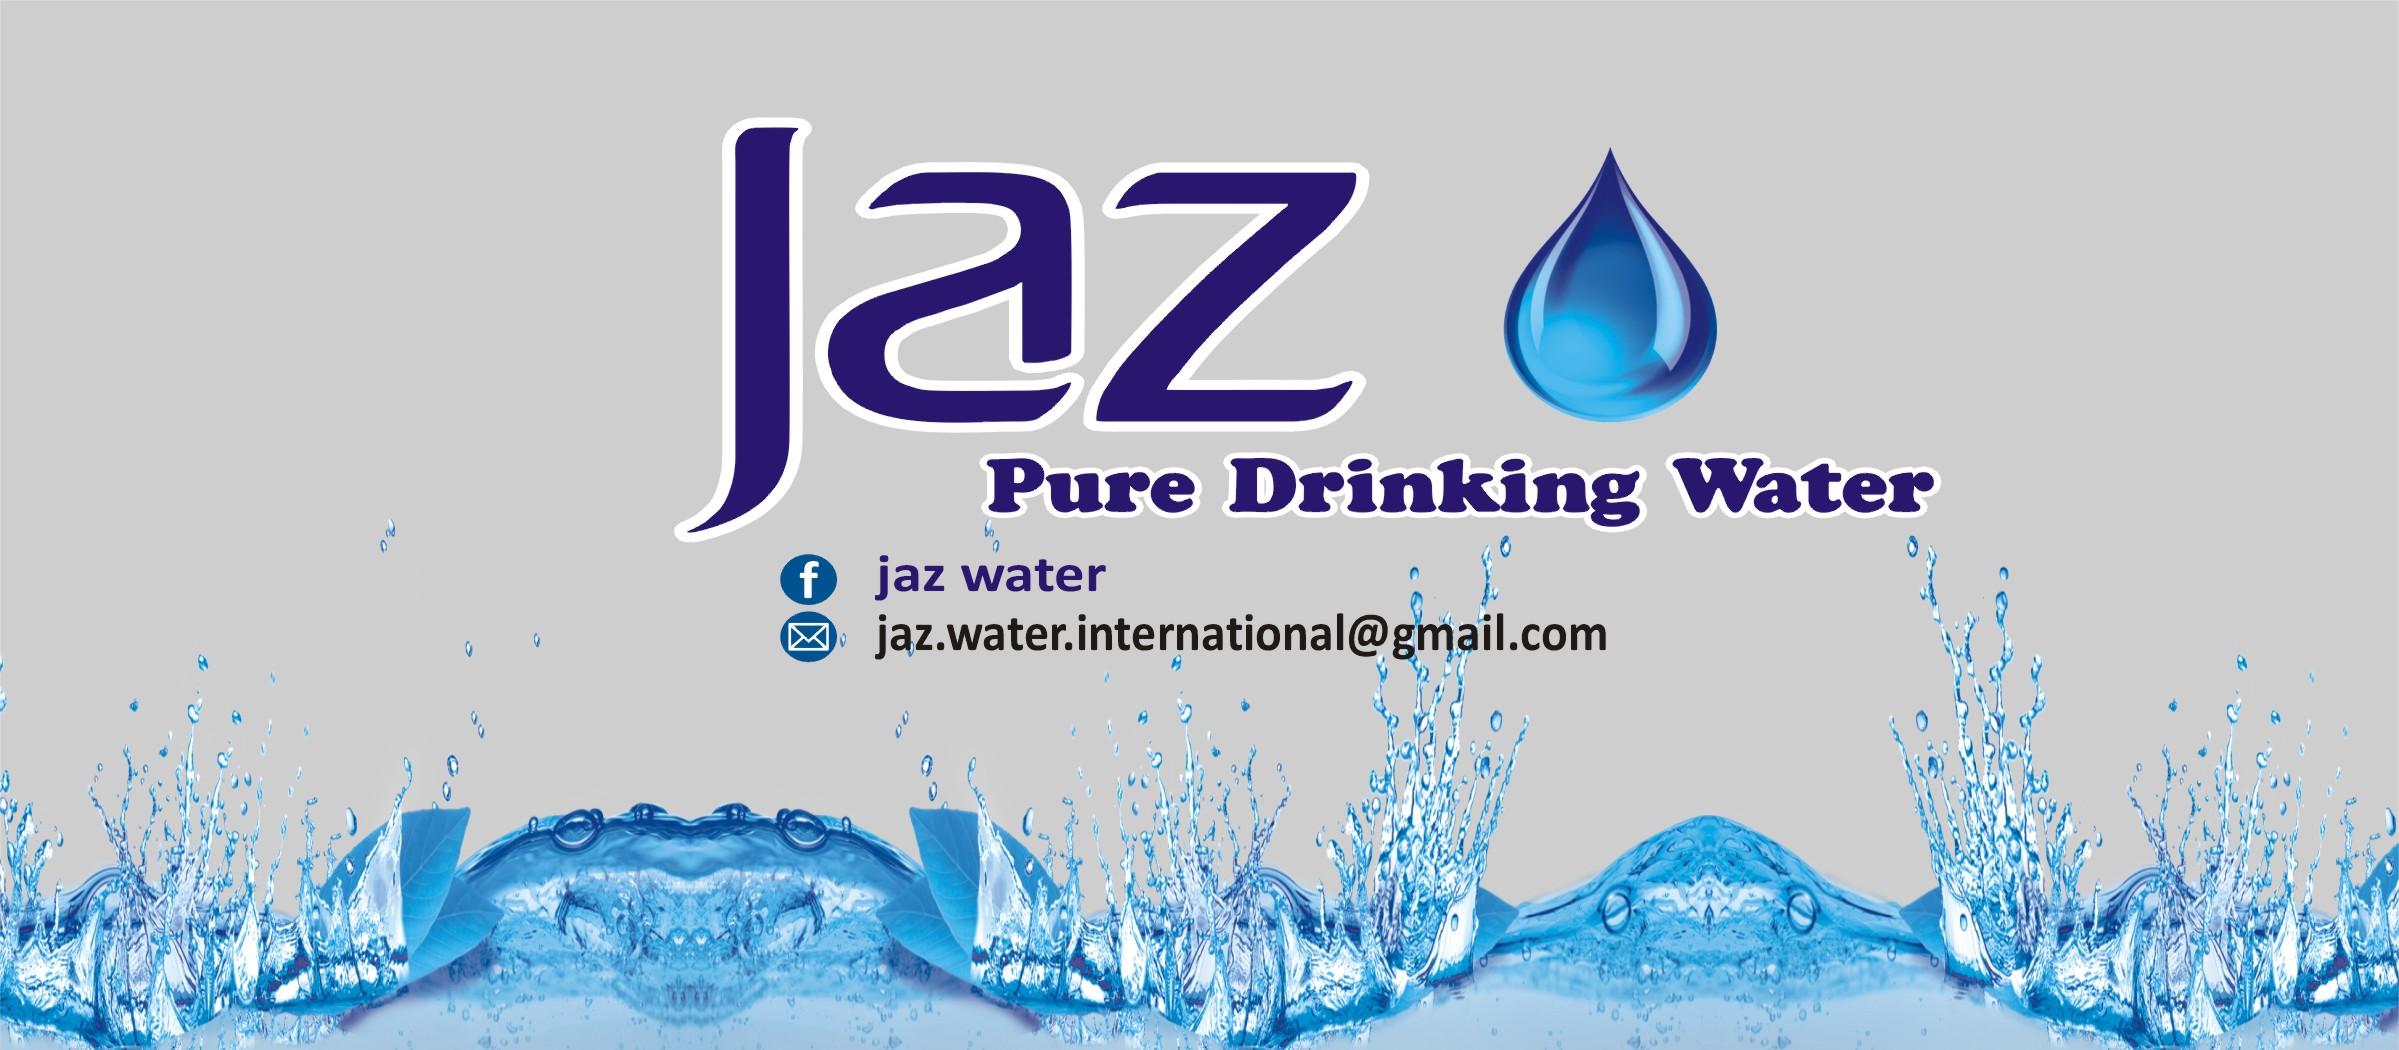 https://www.pakpositions.com/company/jaz-water-pvt-ltd